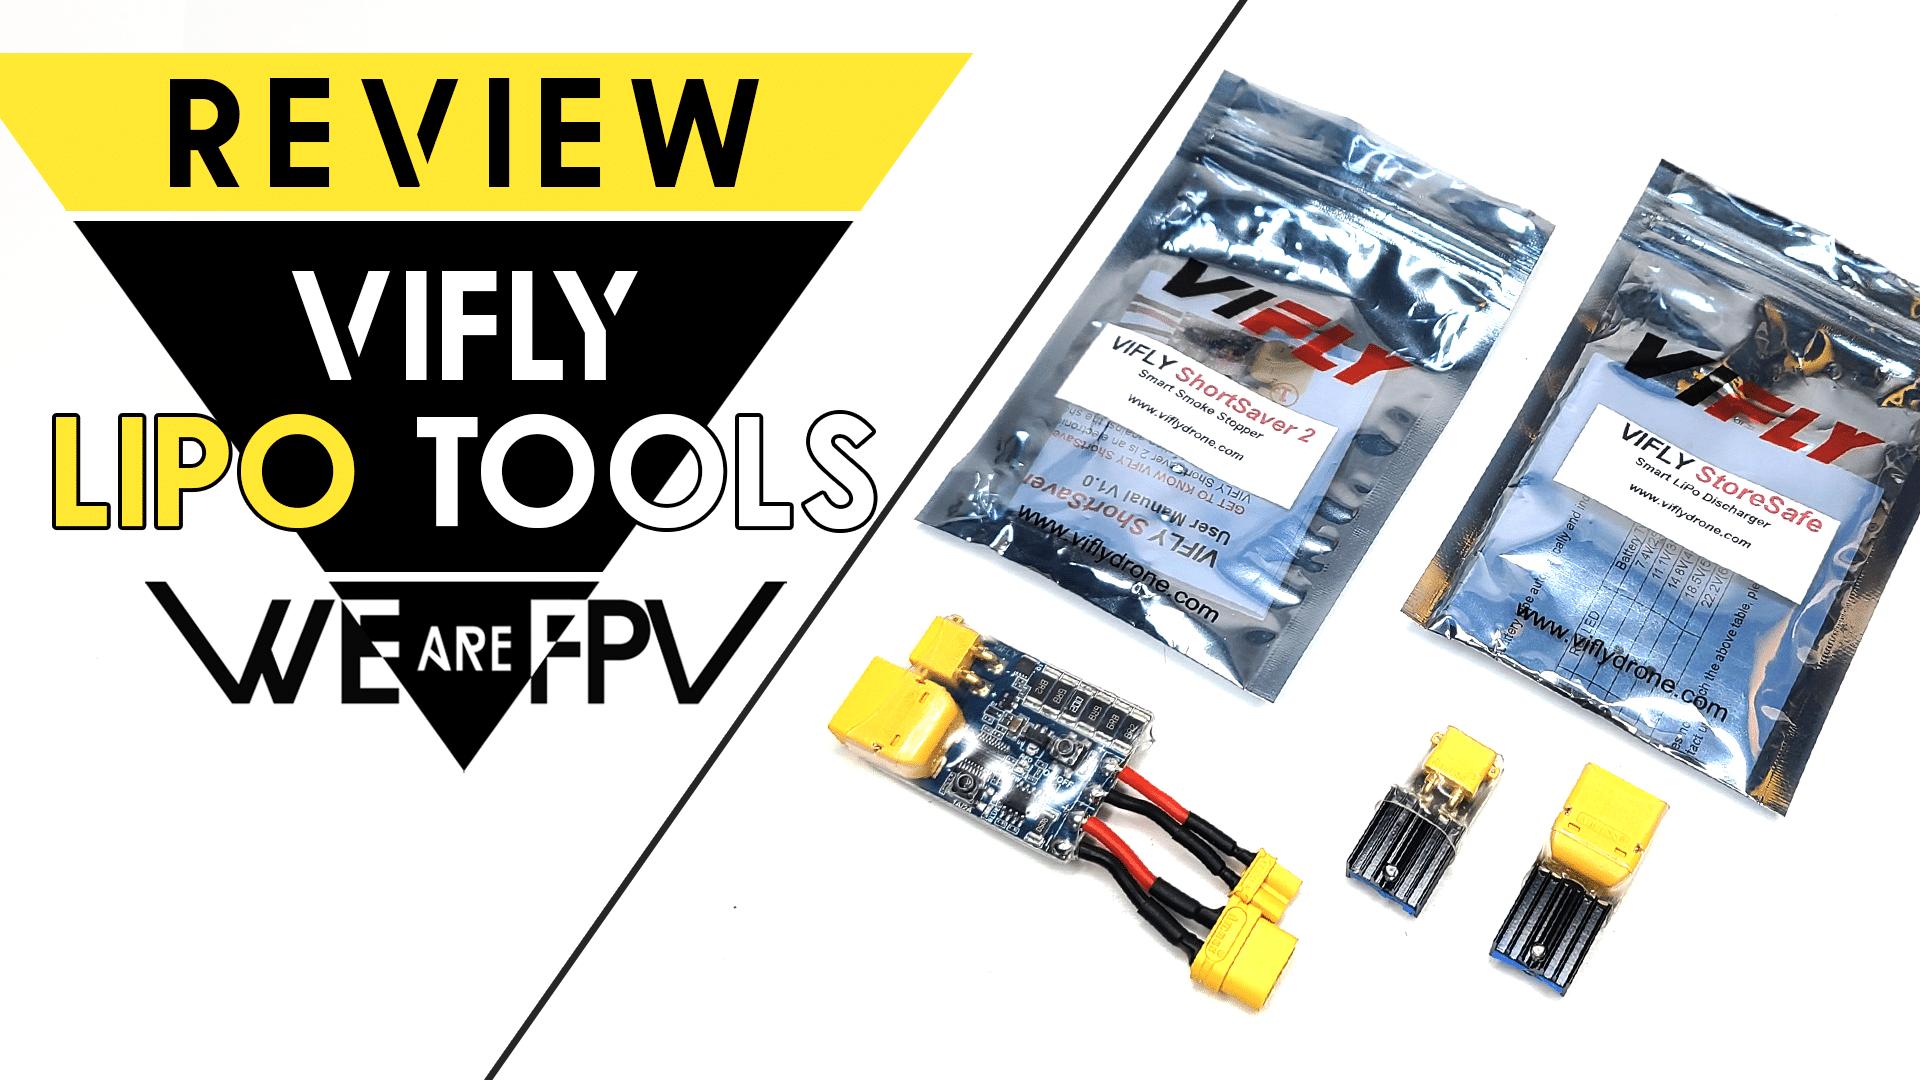 test Vifly StoreSafe ShortSave 2